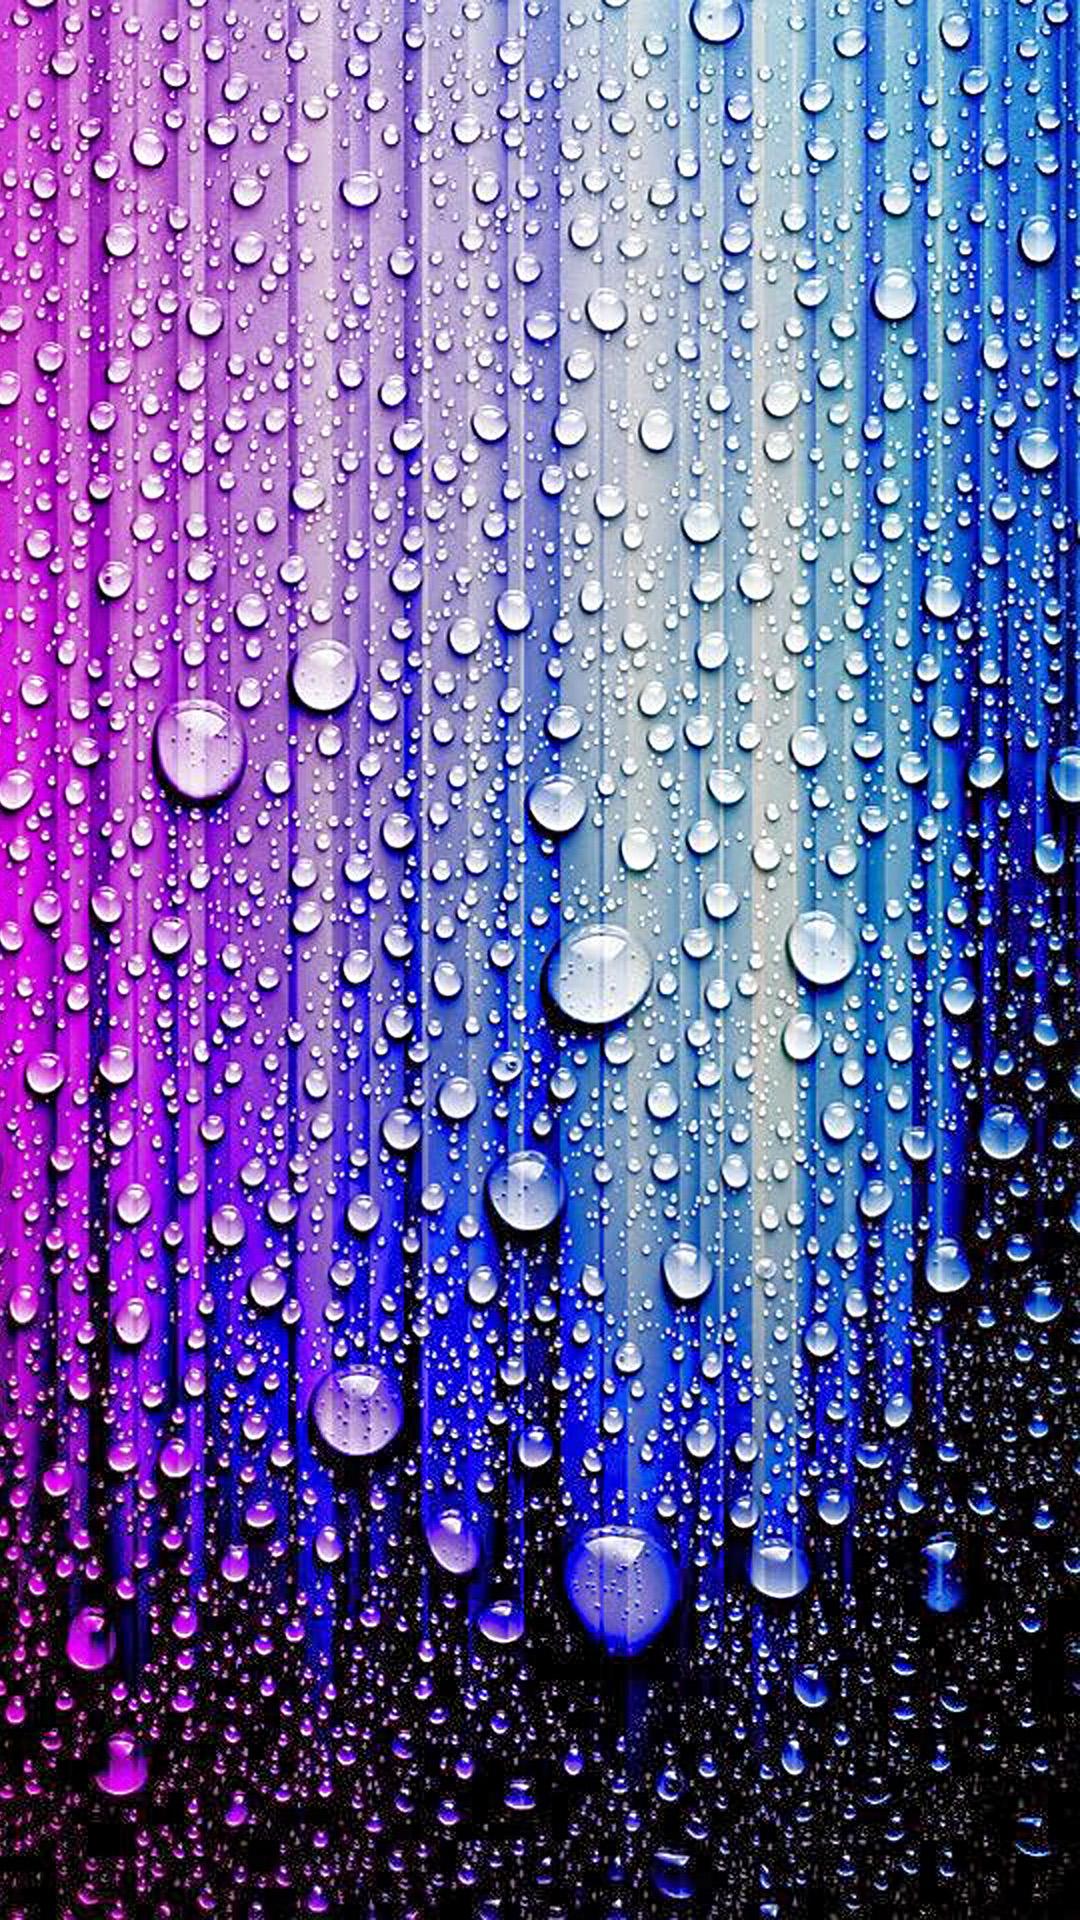 iPhone wallpaper water drops multicolors Water drops